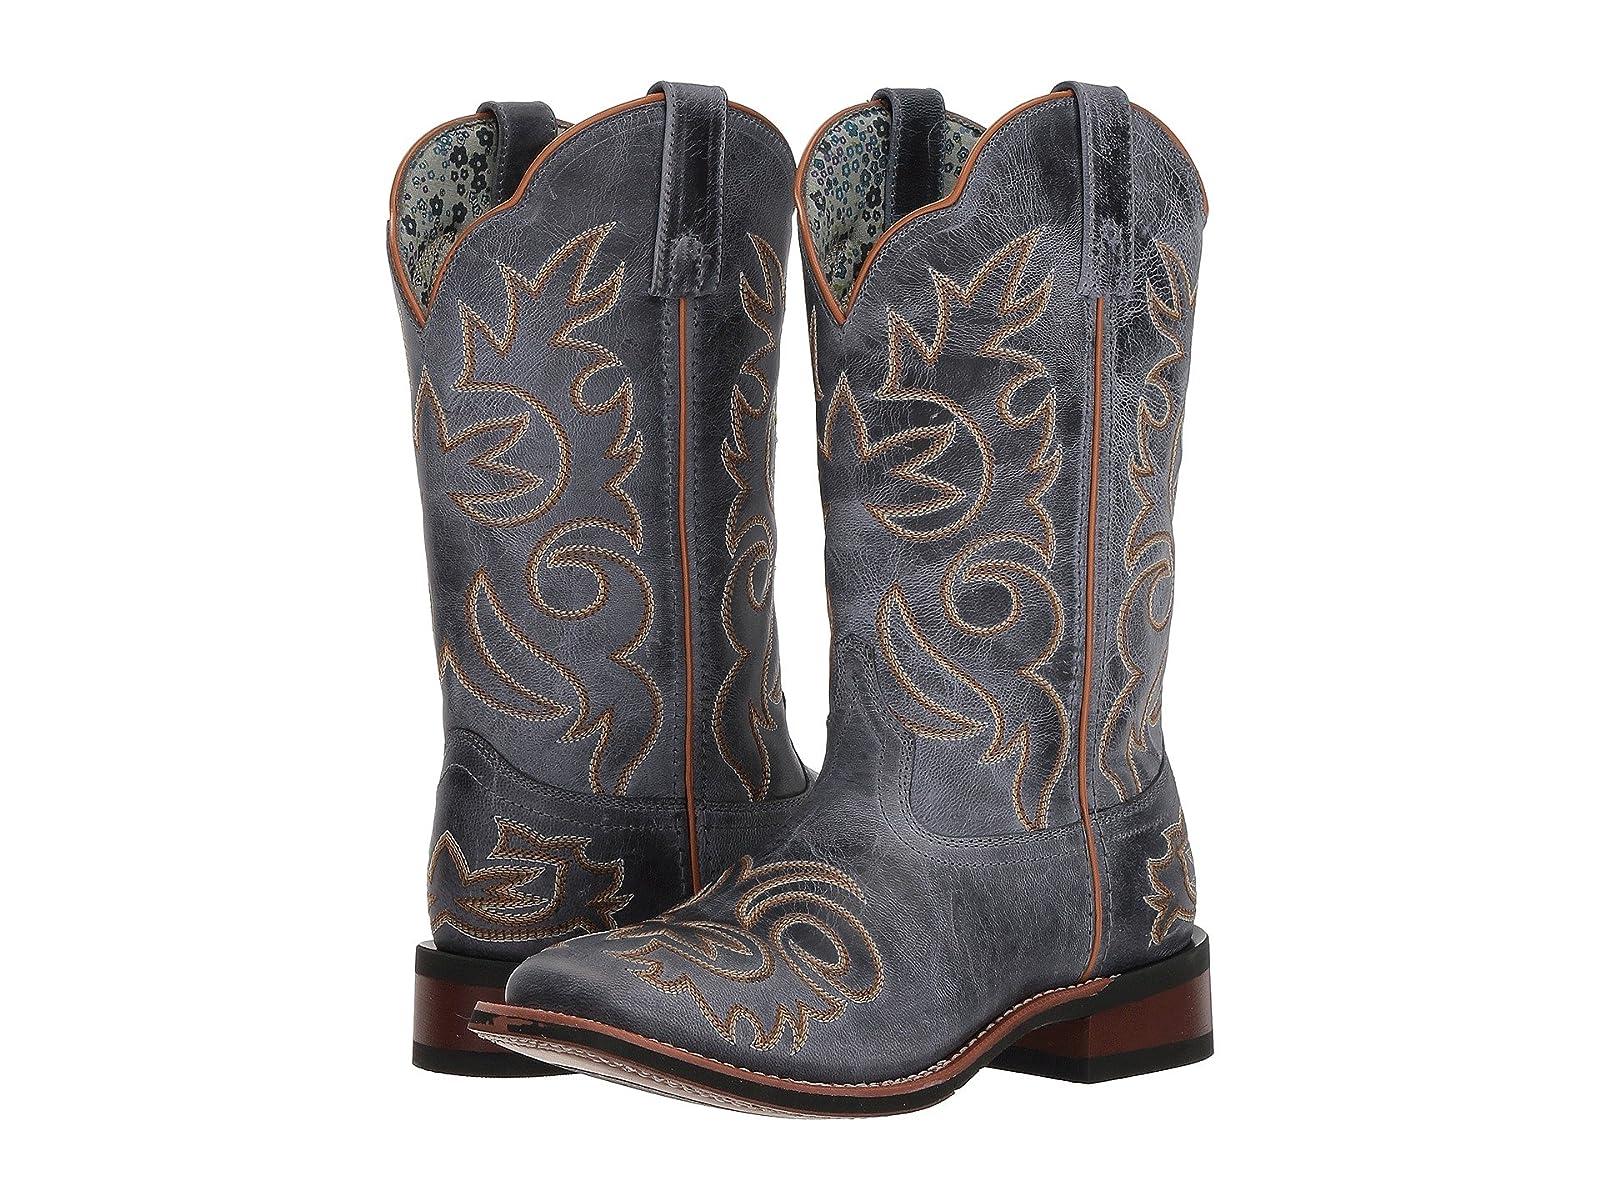 Laredo EvaAffordable and distinctive shoes